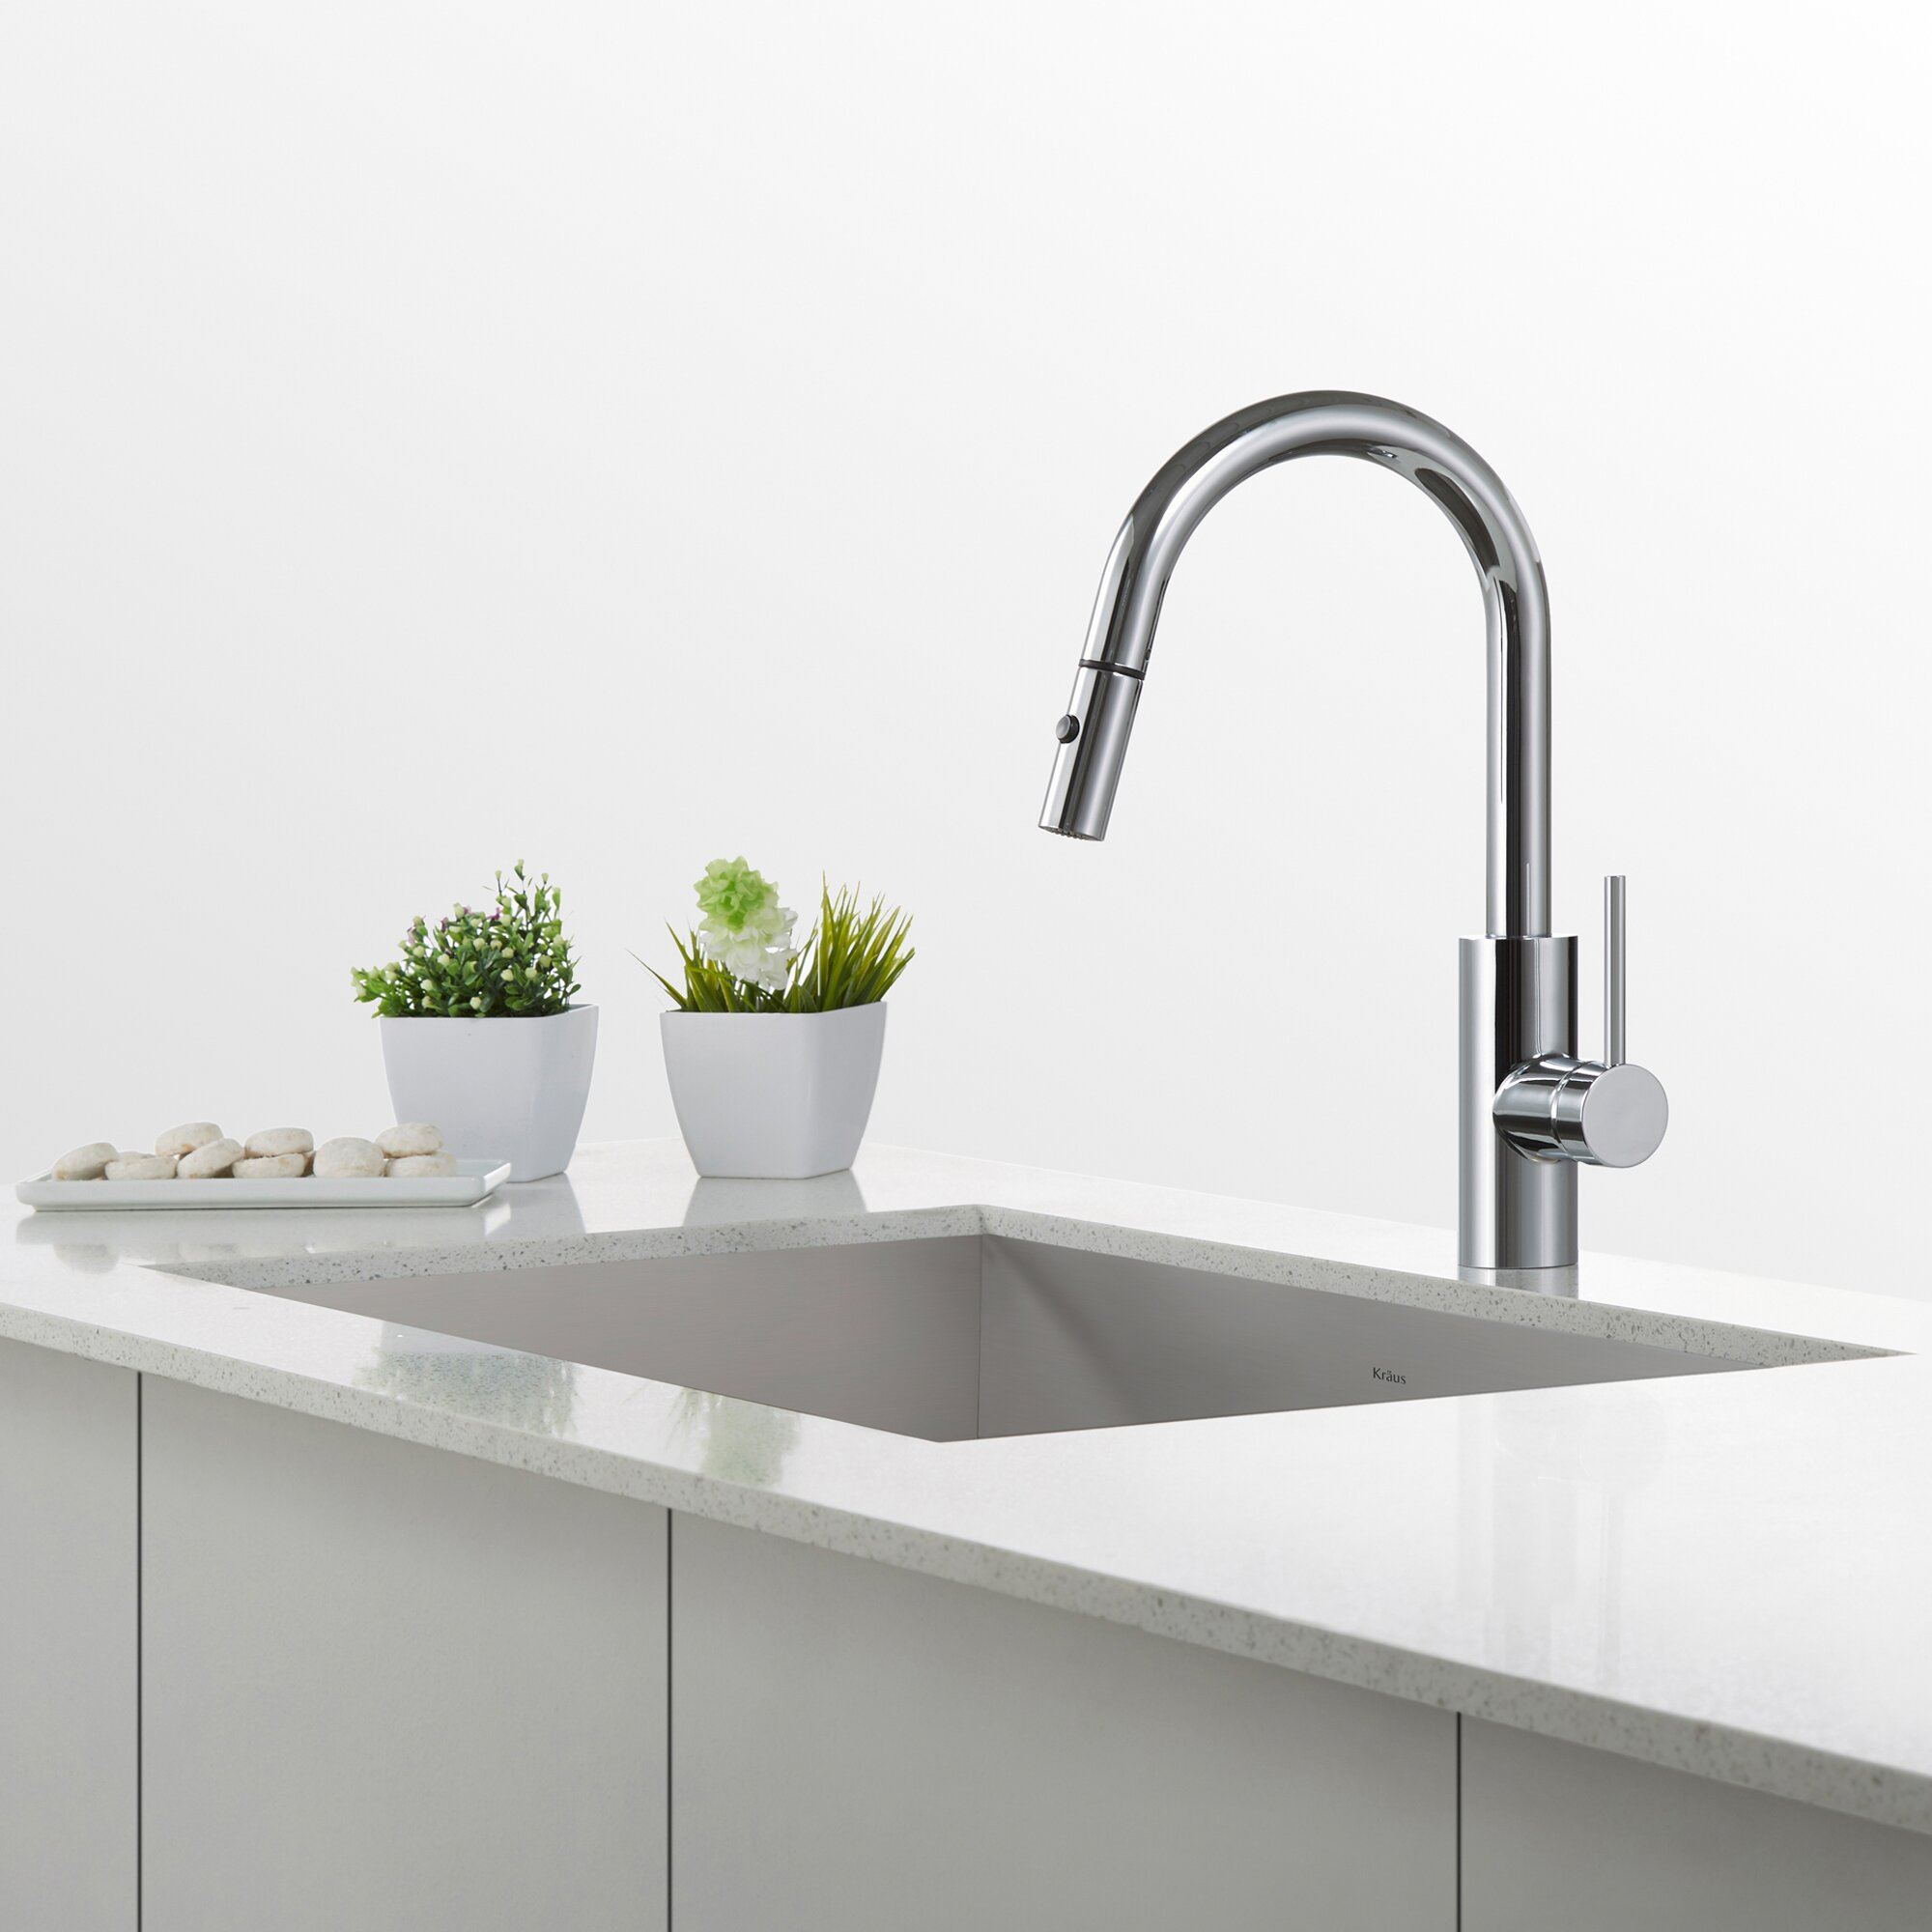 Kraus Mateo Single Lever Kitchen Faucet